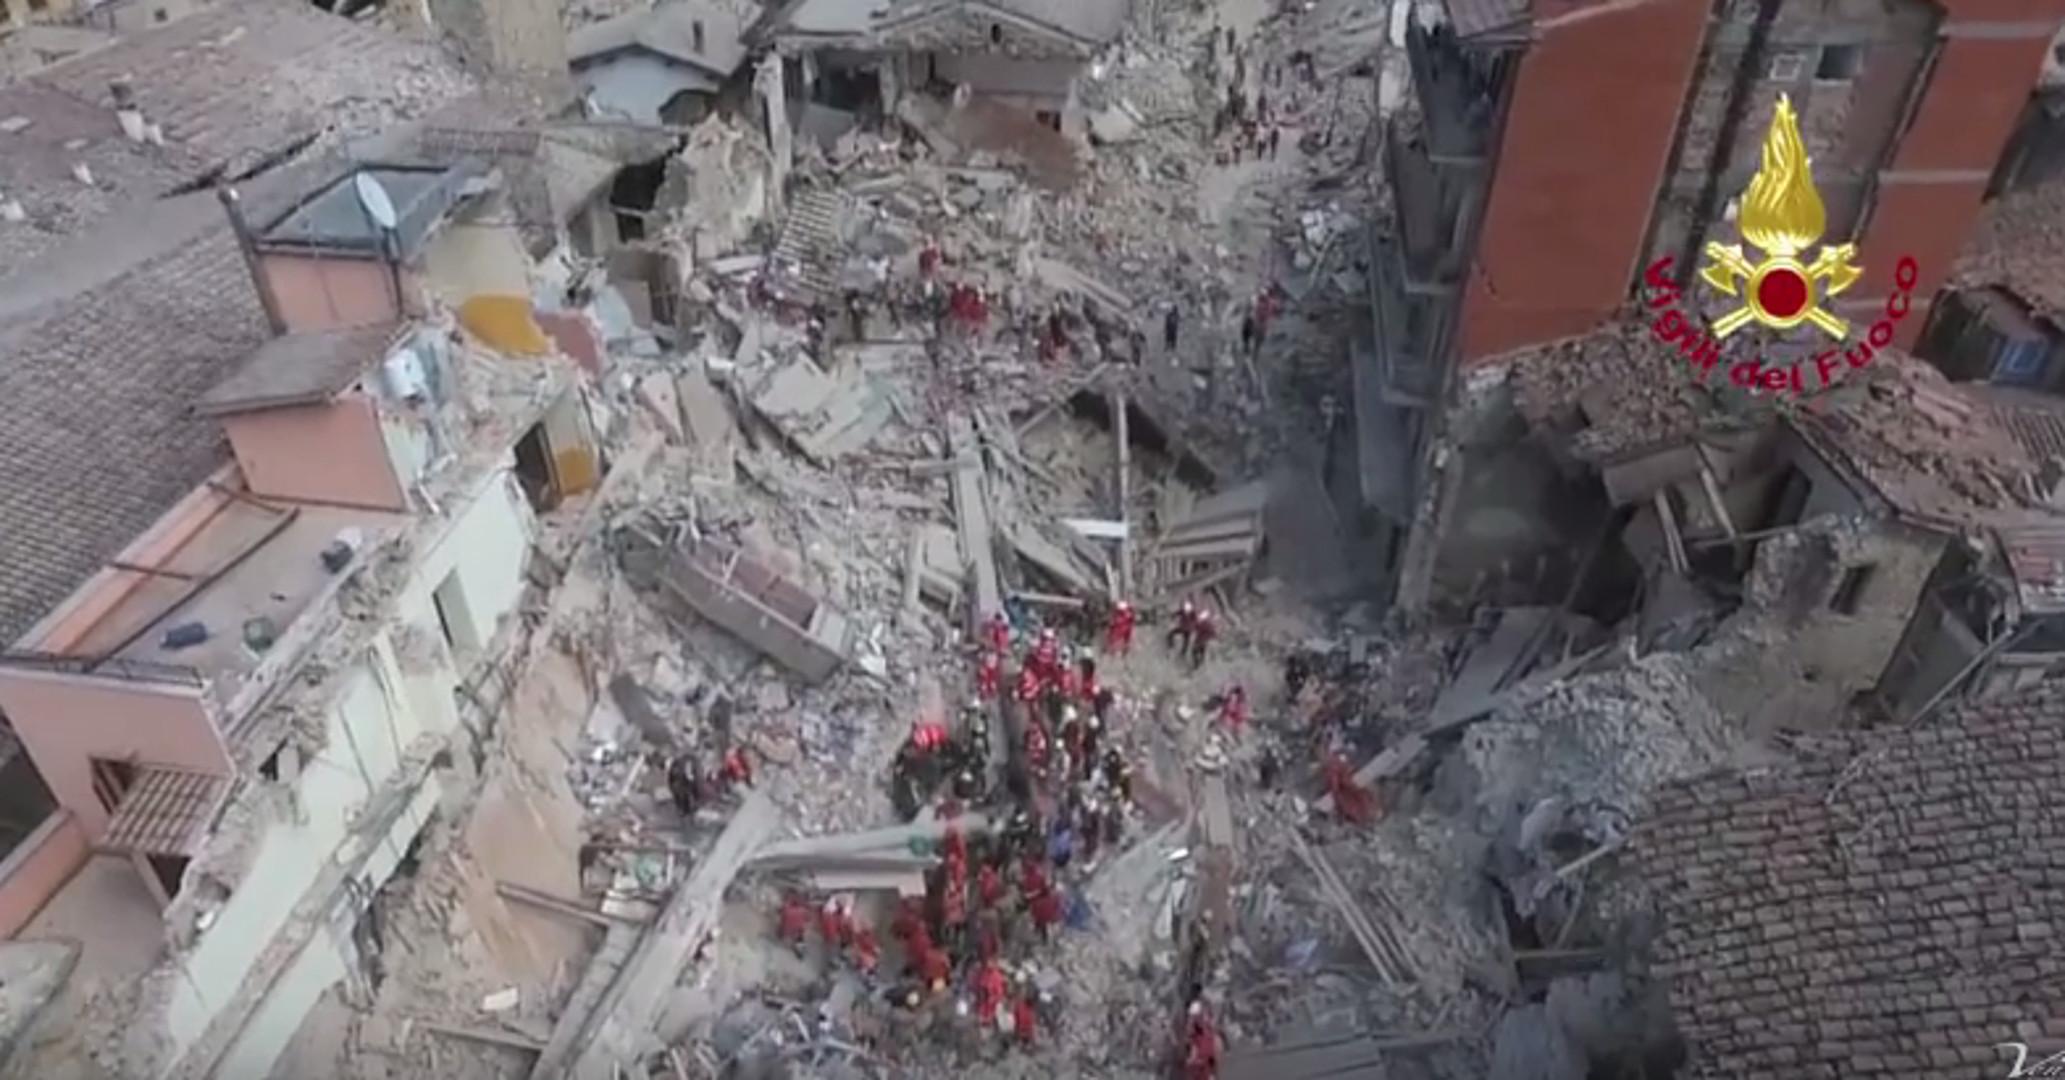 Erdbeben in Italien: Drohnenaufnahmen aus Amatrice